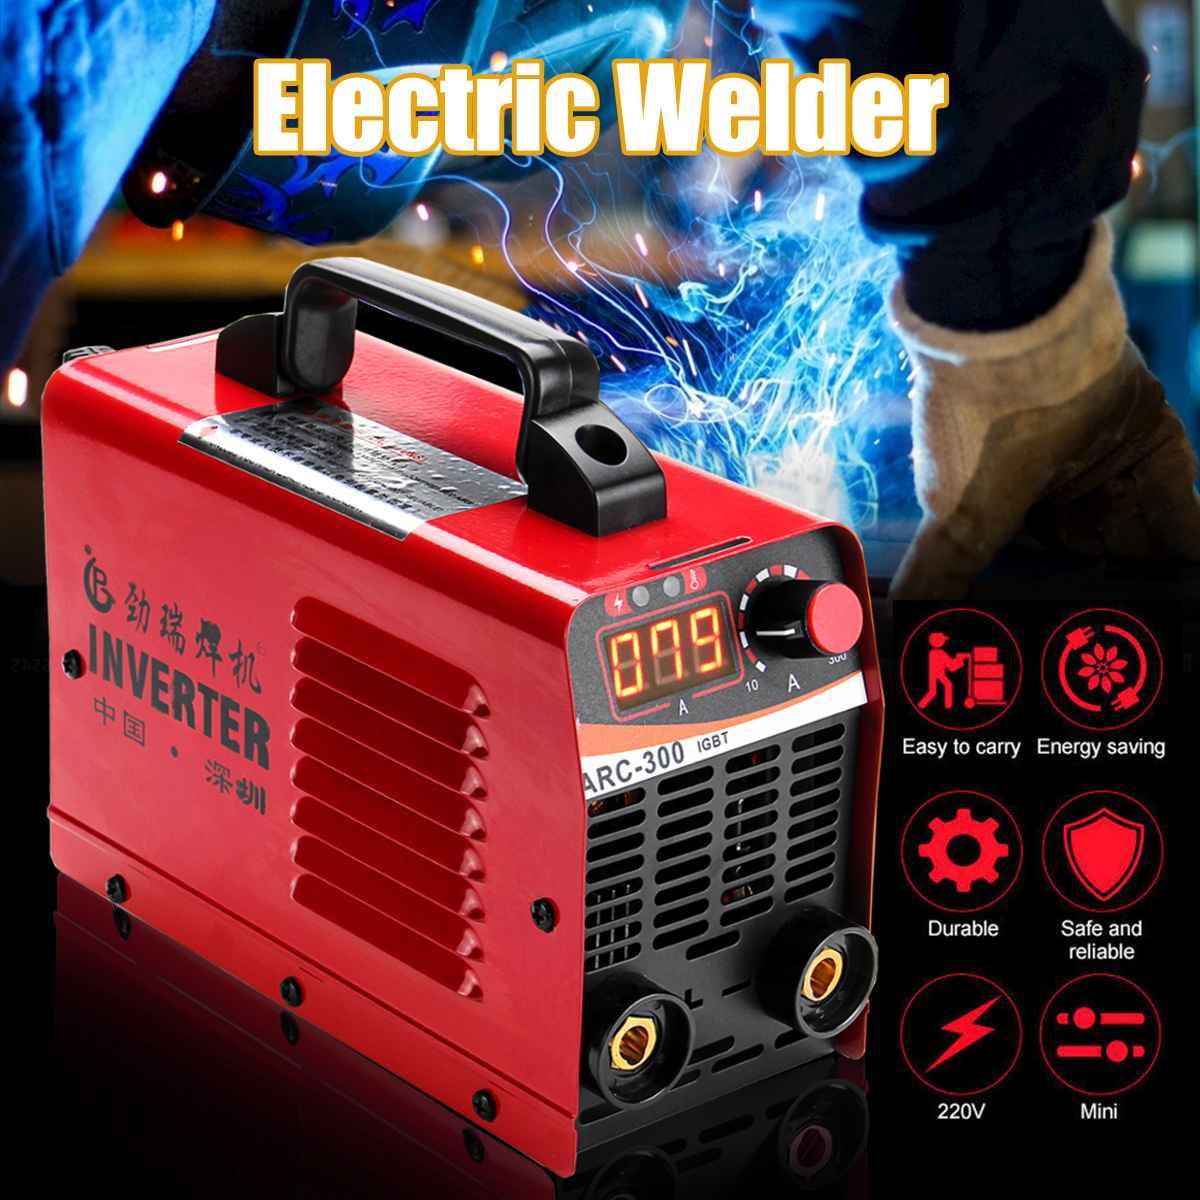 ARC-300 220V LCD Electric IGBT Inverter MMA ARC ZX7 Portable Welding Machine Arc Welders (Ramdom Color)